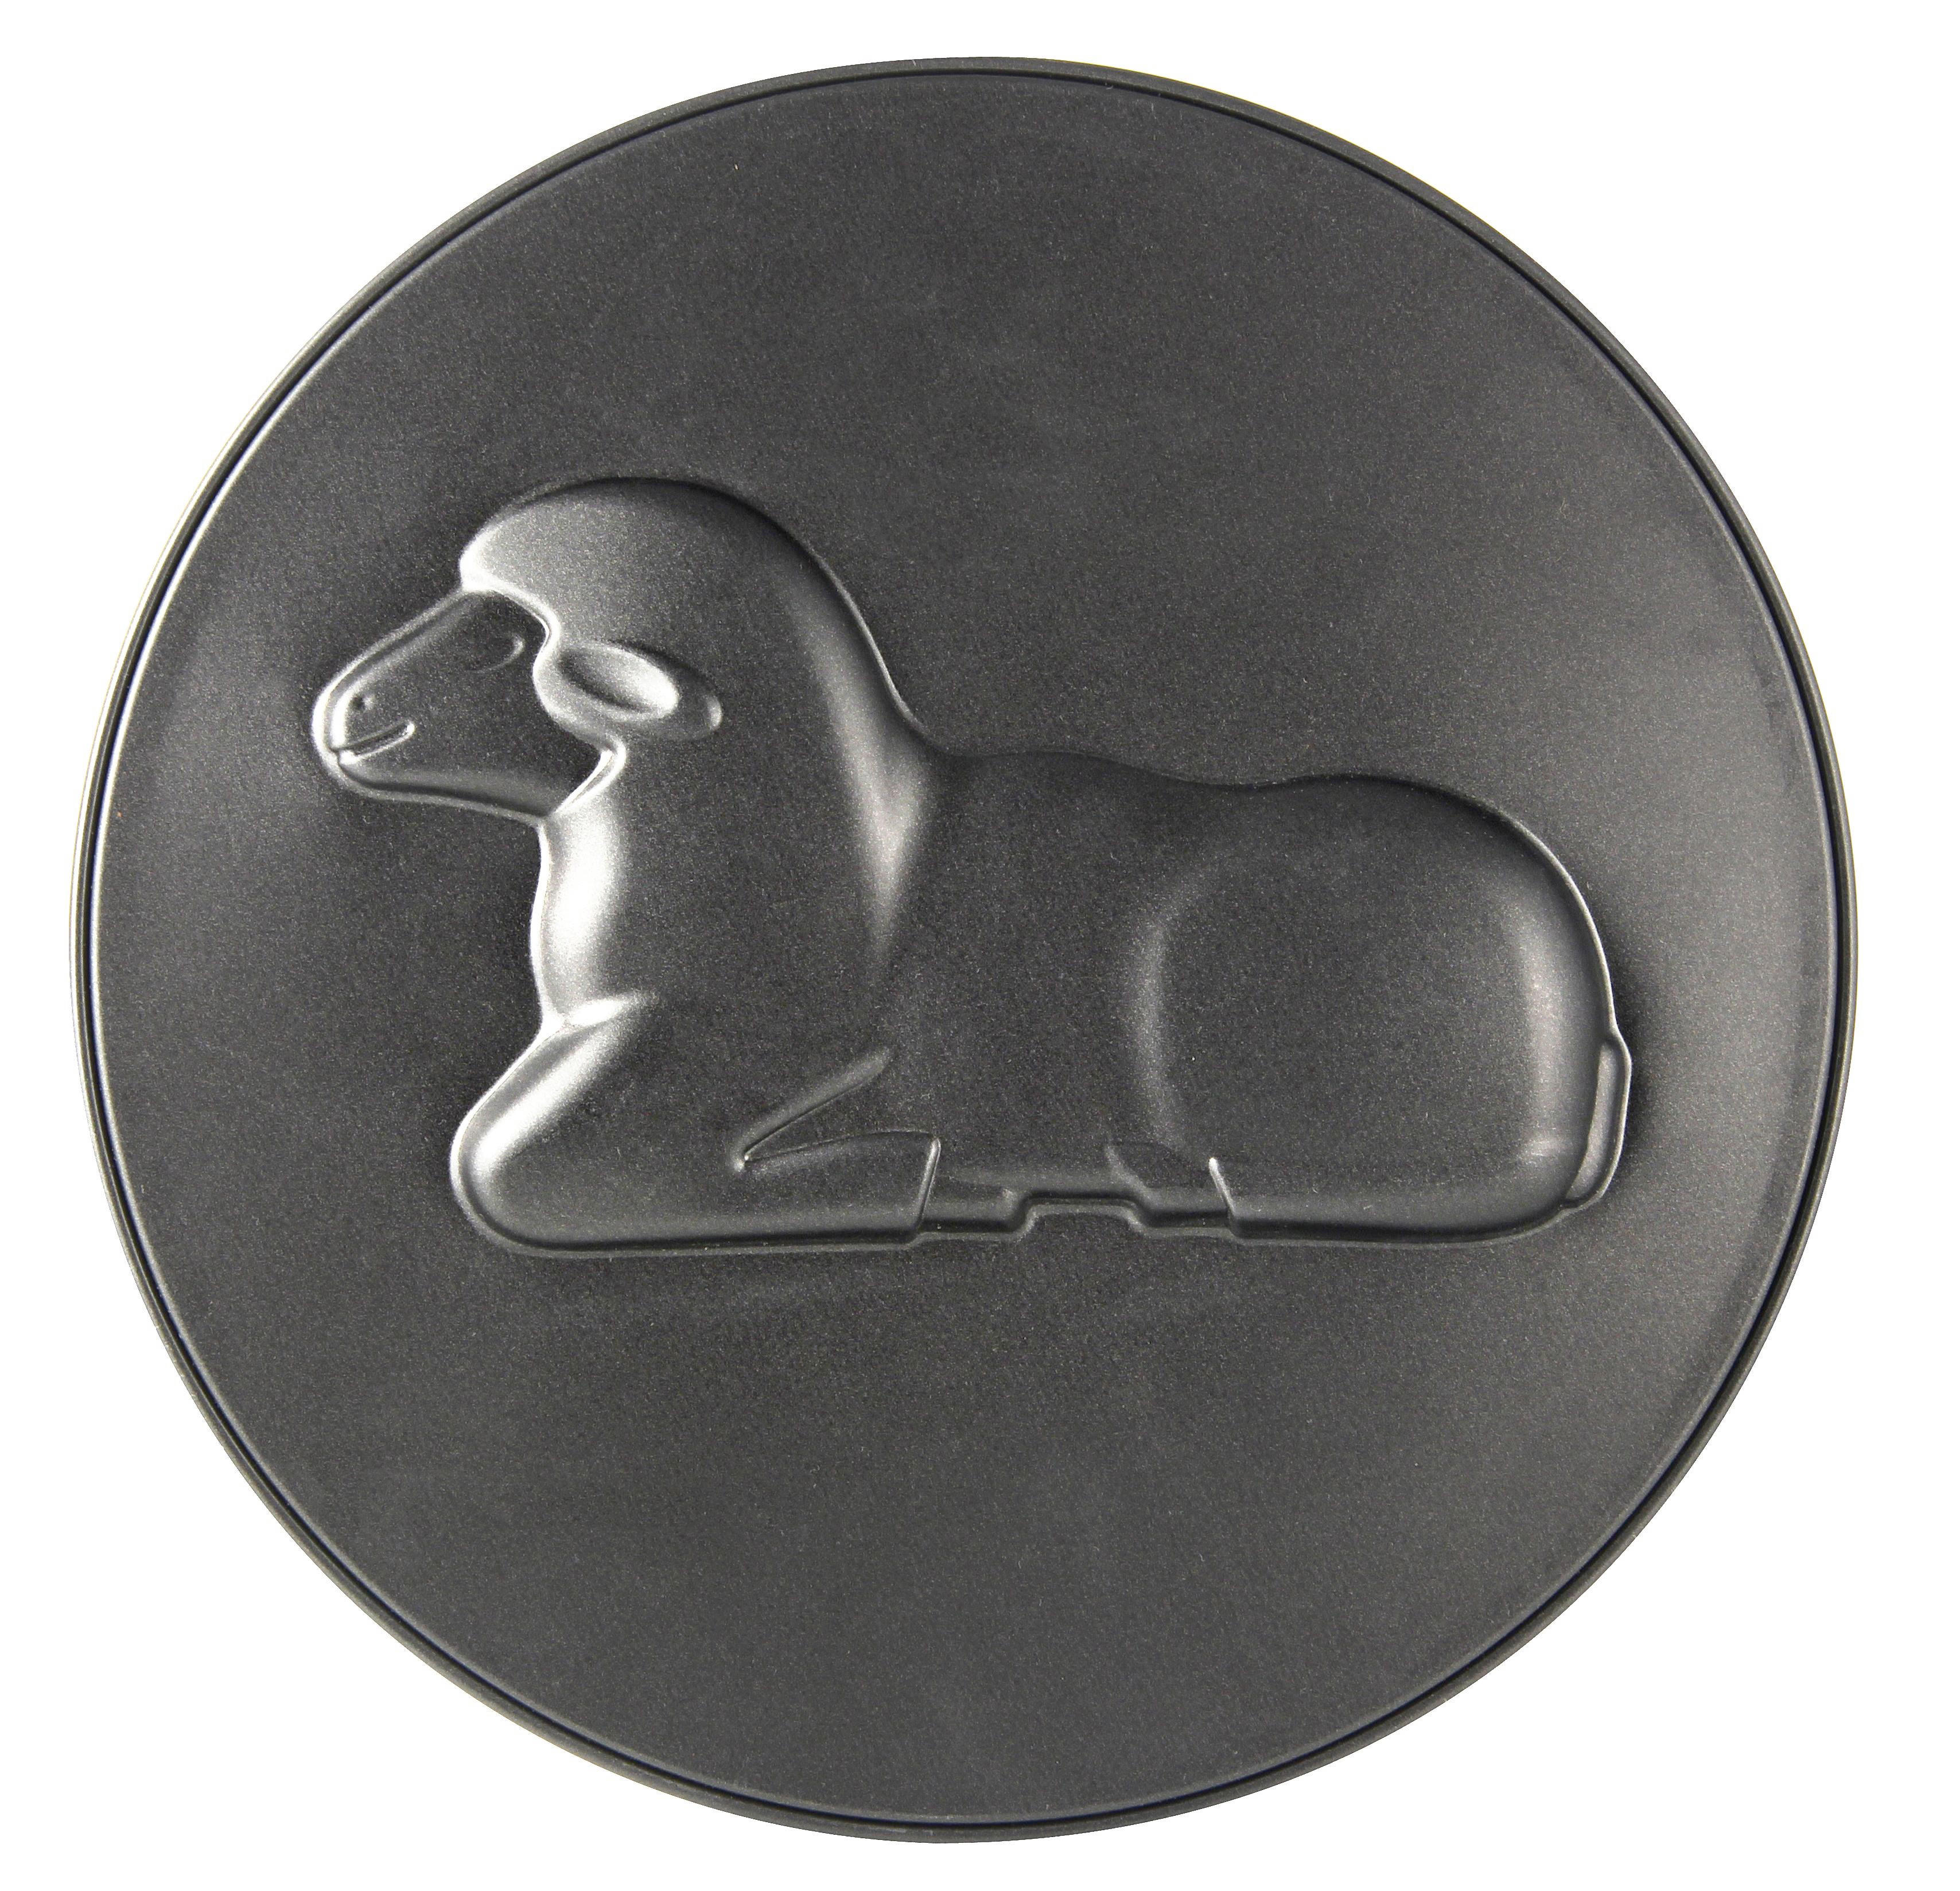 BACKFORMENSET - Schwarz, Metall (26/6,5cm)